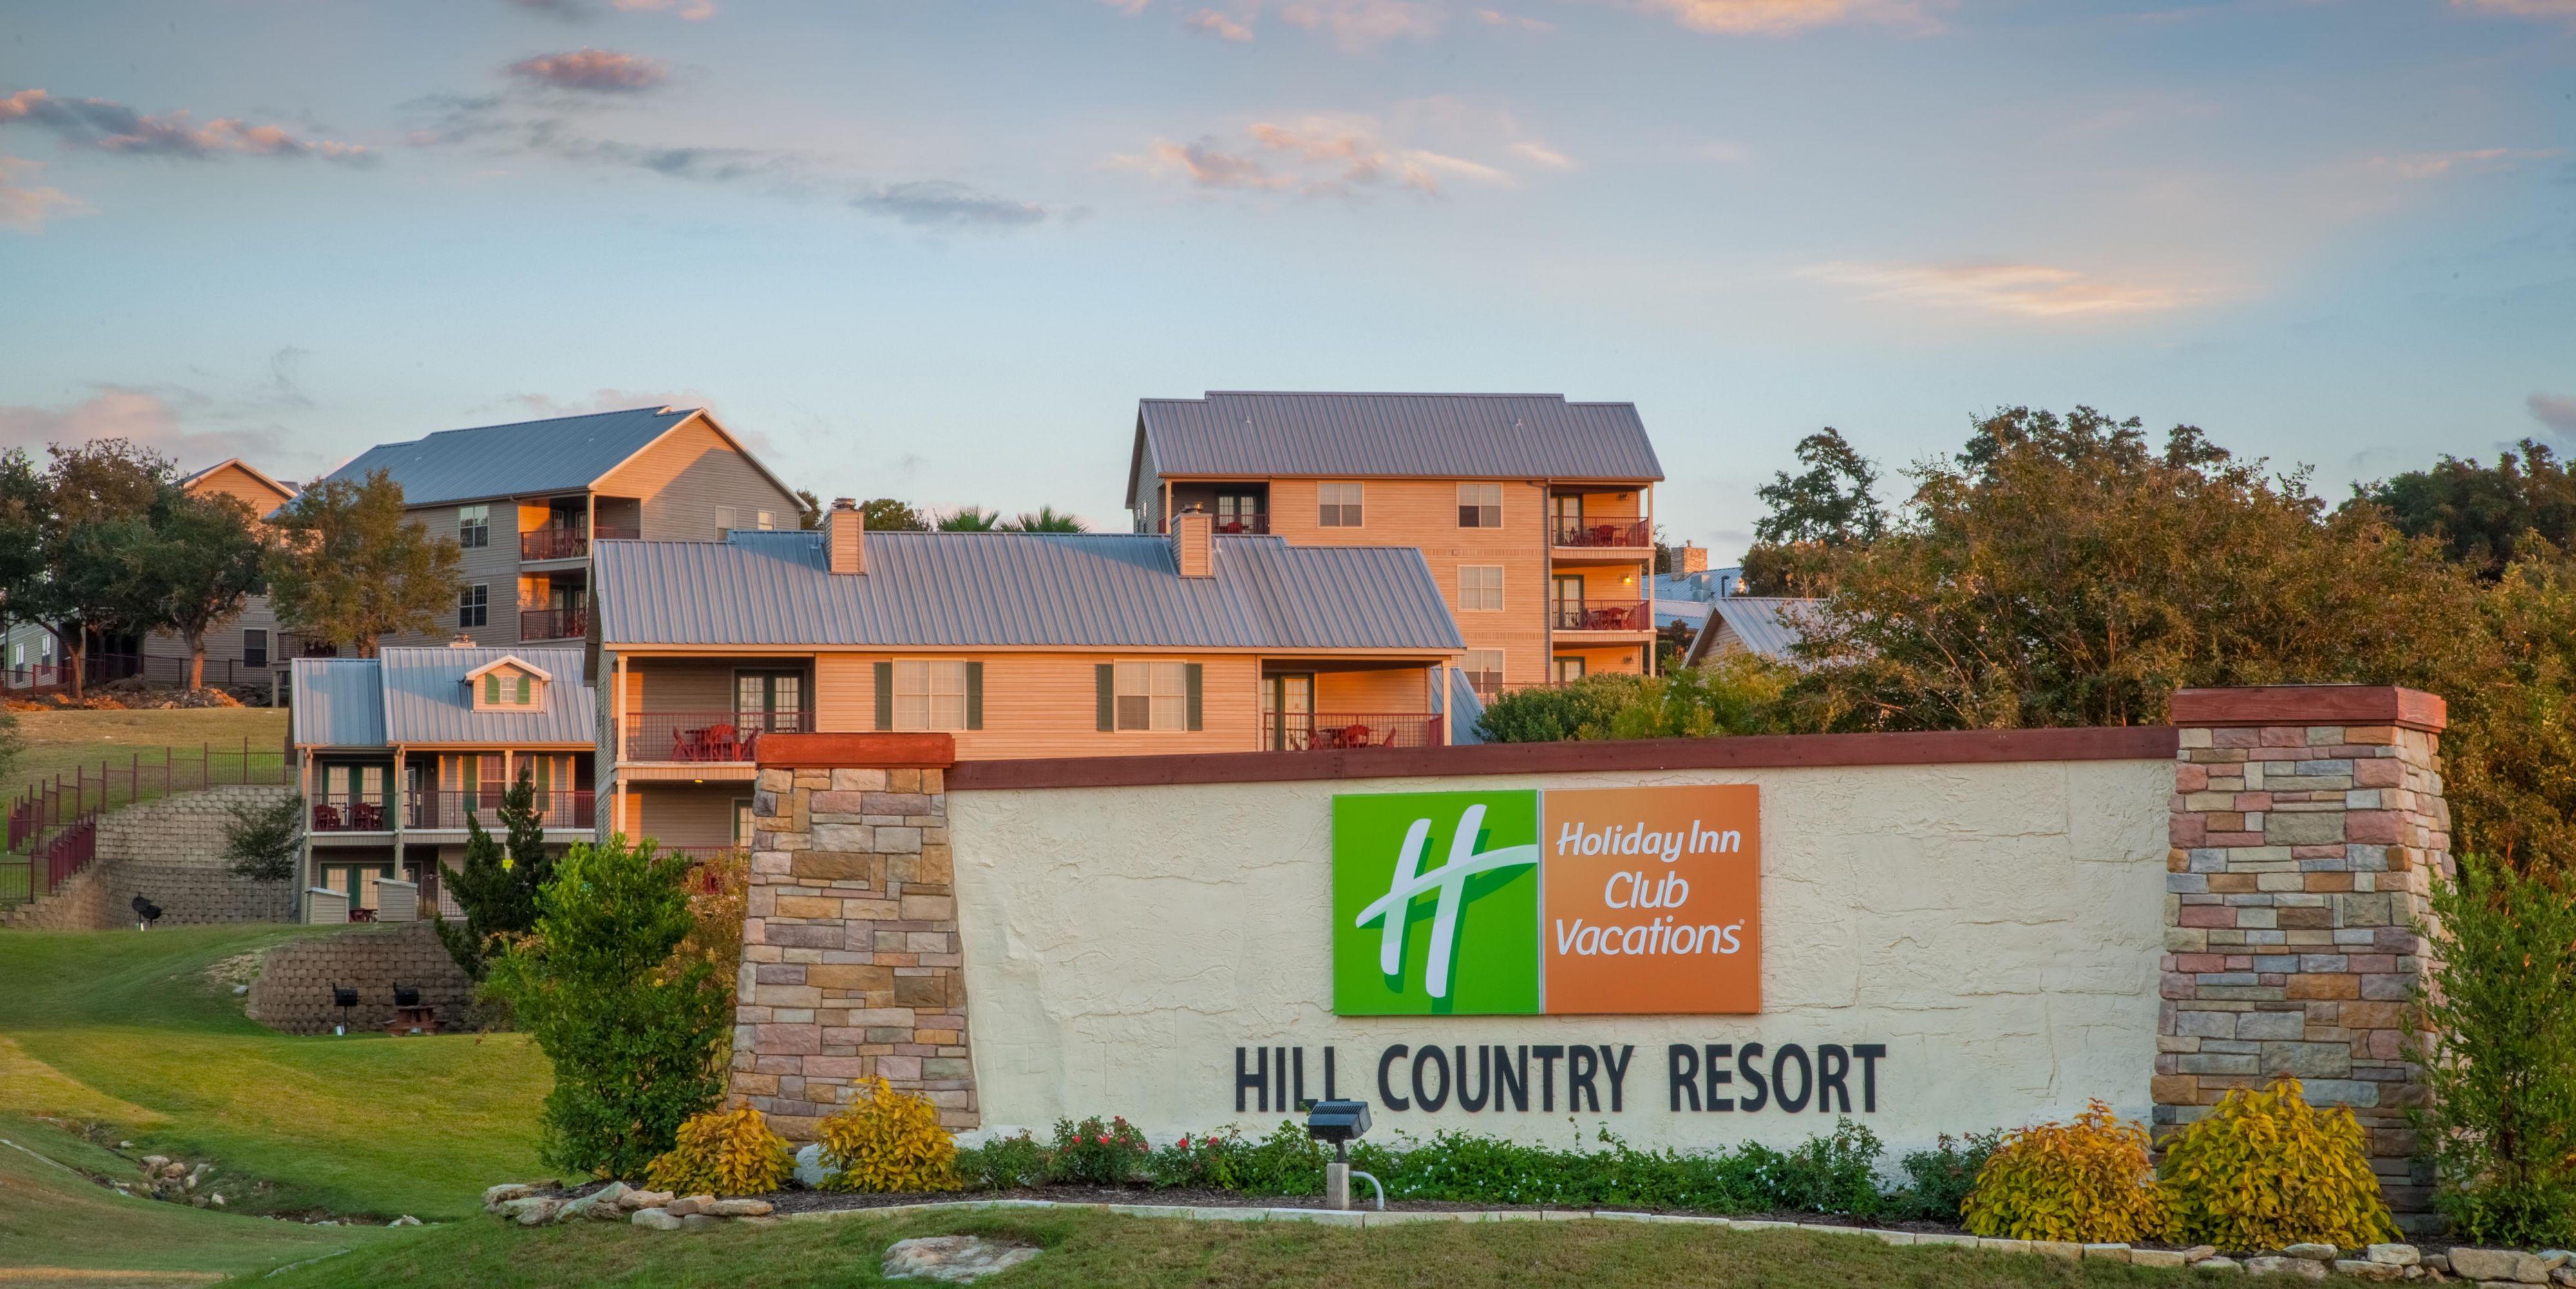 Map Of Orange Lake Resort Florida.Explore Holiday Inn Club Vacations Resorts